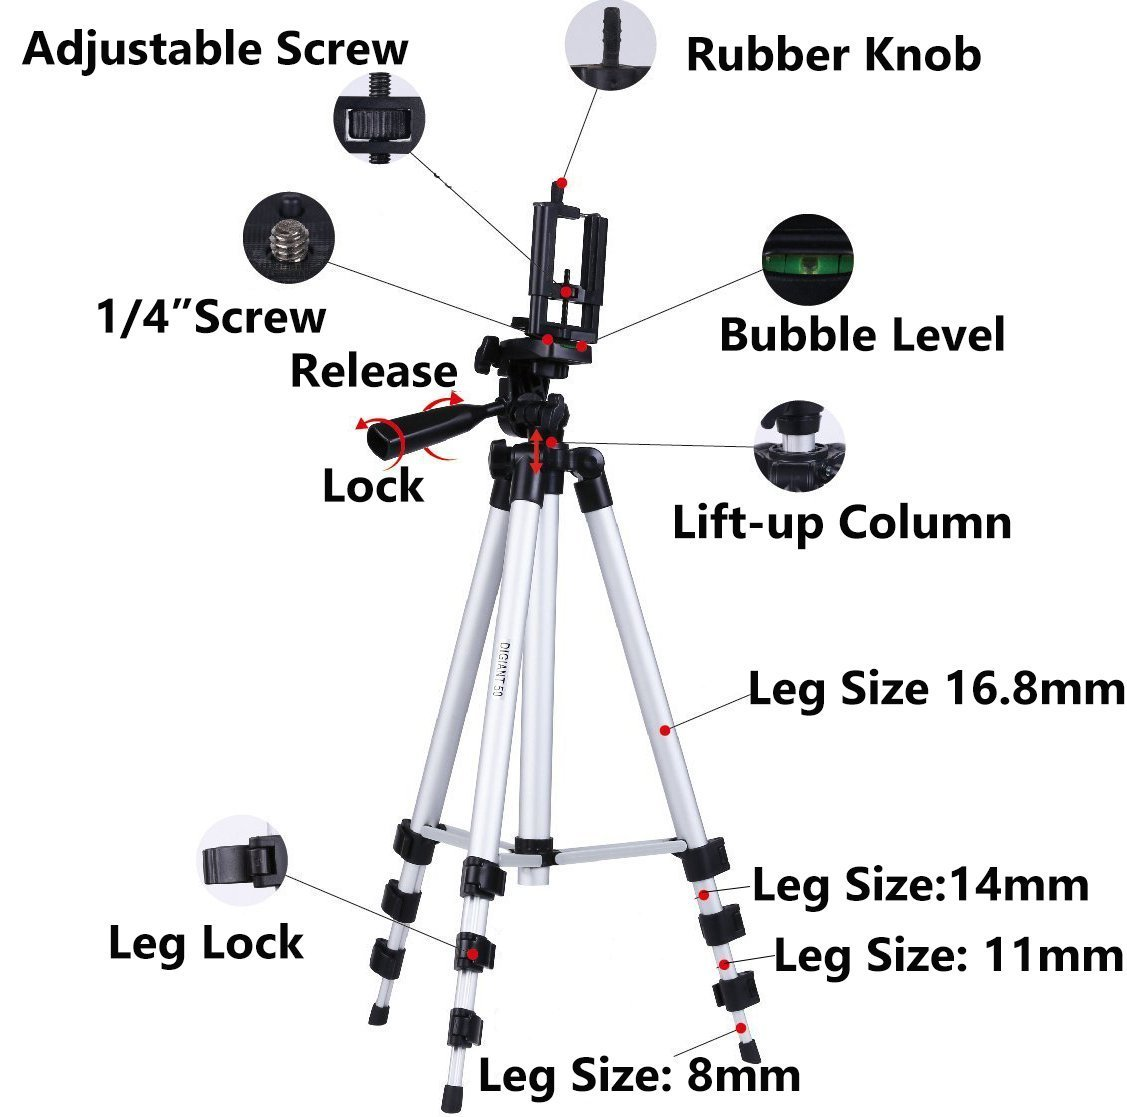 351237551015 in addition Hikvision Ds 1272zj 120b moreover Universal Vesa Vu Adapter further 201453142191 moreover 331854044242. on samsung camera mount